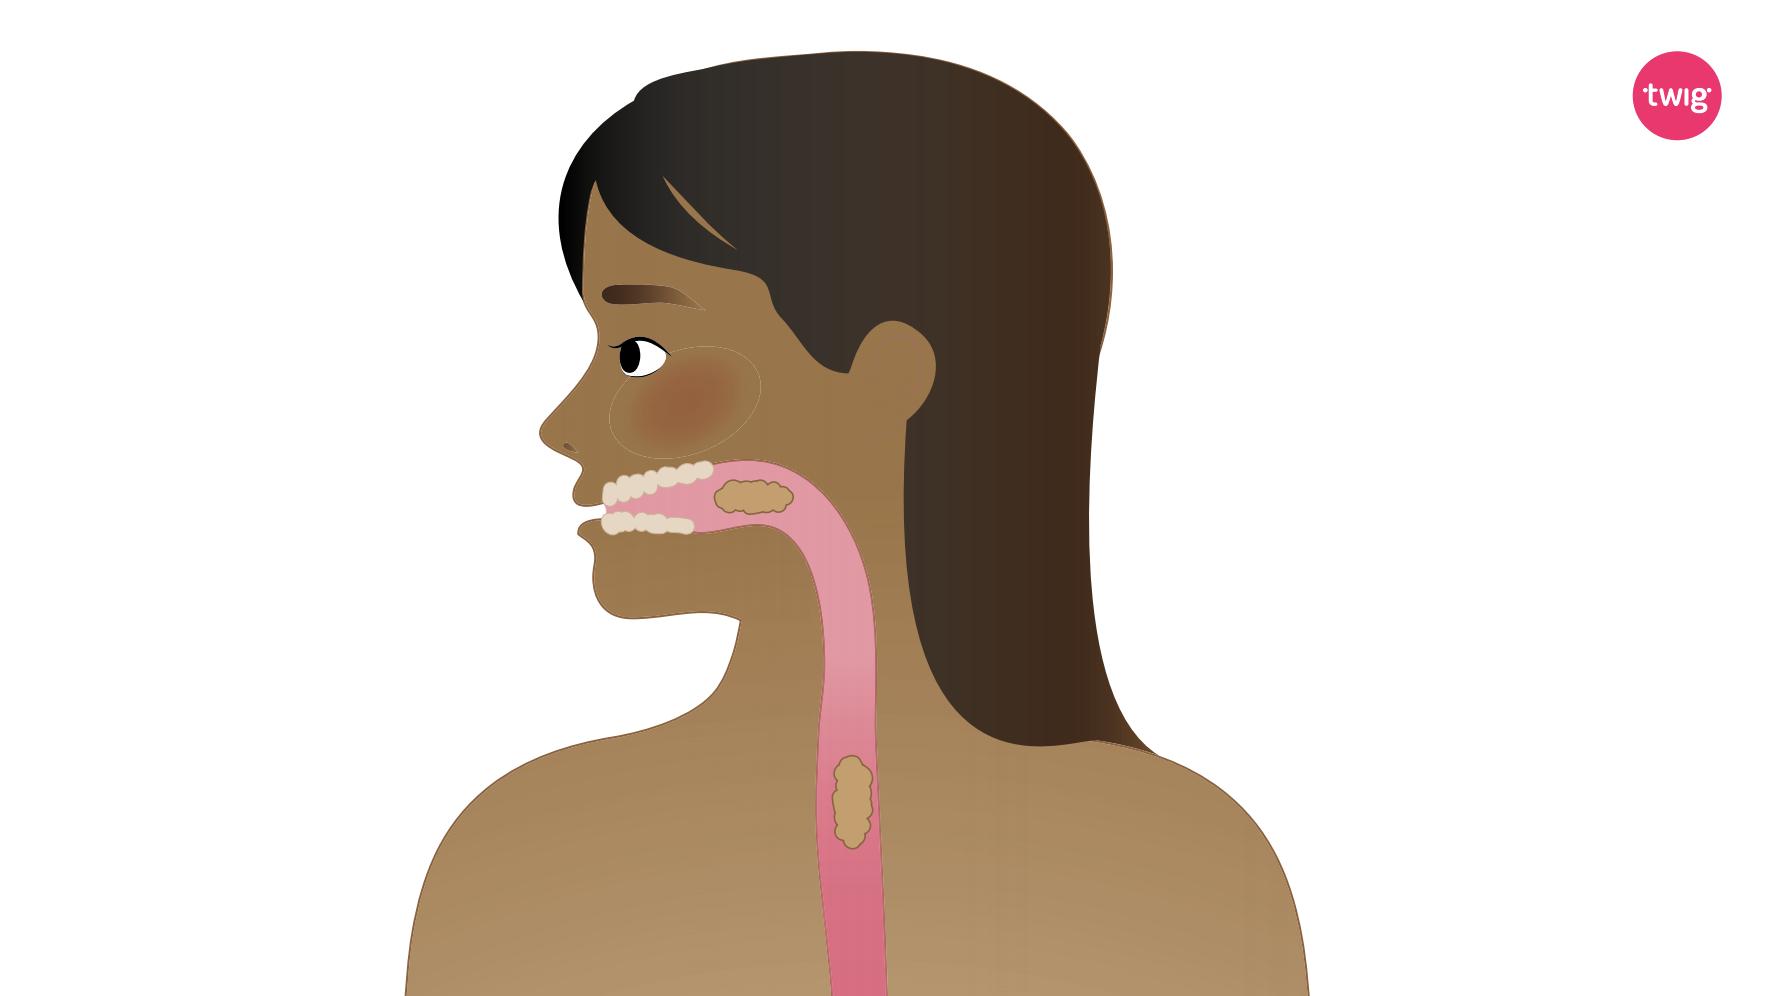 Digestion visual